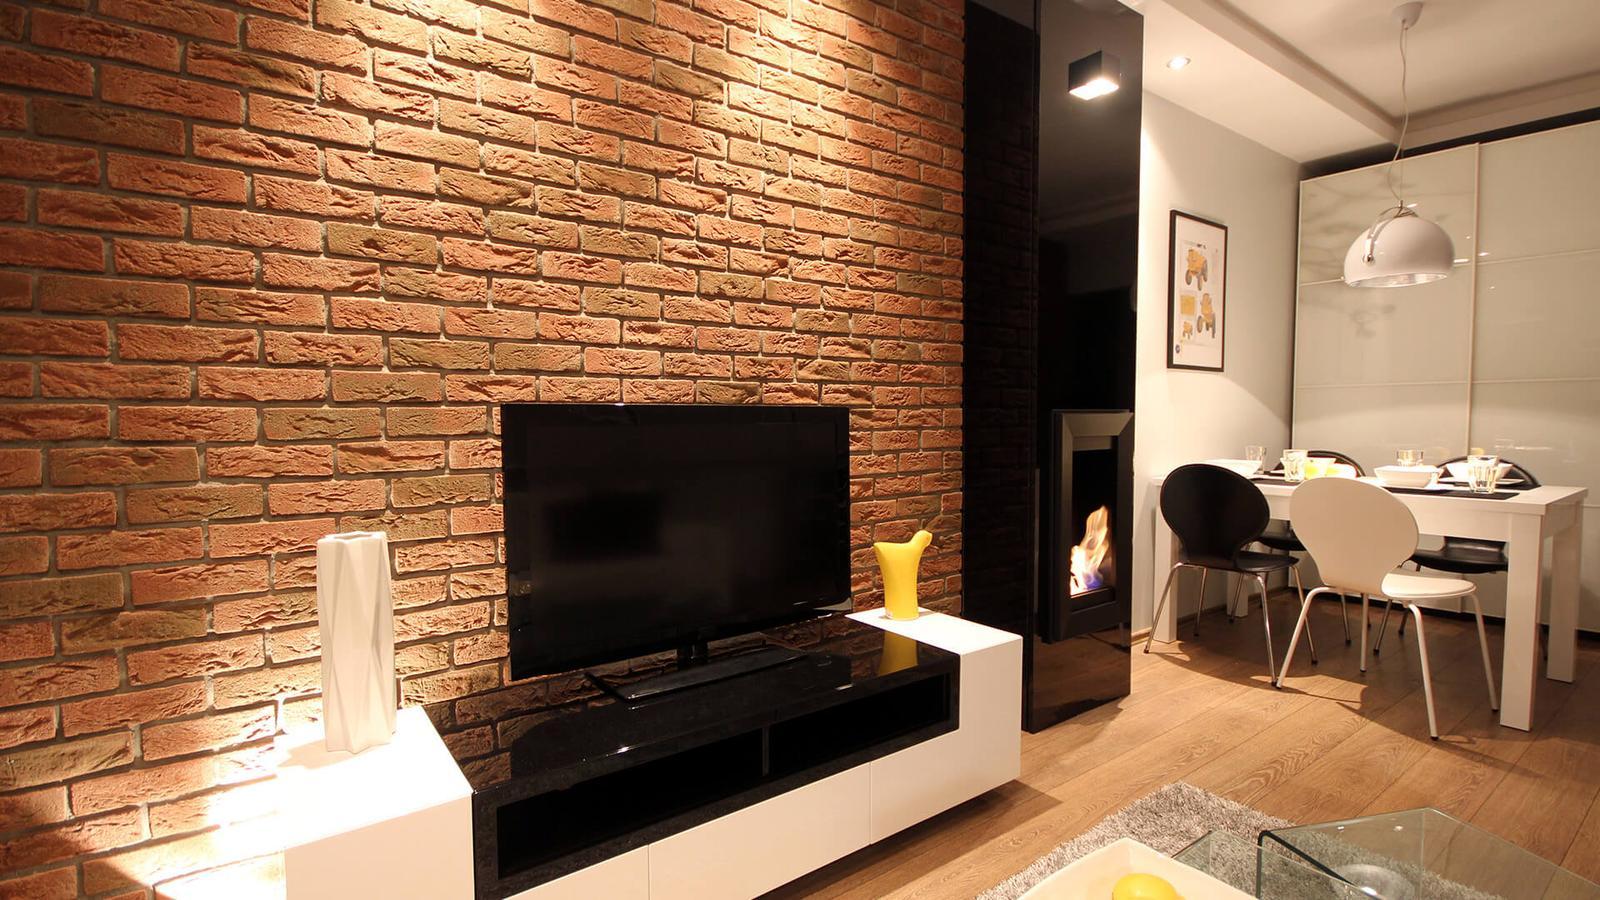 tehlové a  kamenné obklady  - REALIZACIE - tehl. obklad country 640, cenníková cena 22 eur/m2 , zlavy až do výšky 15 %